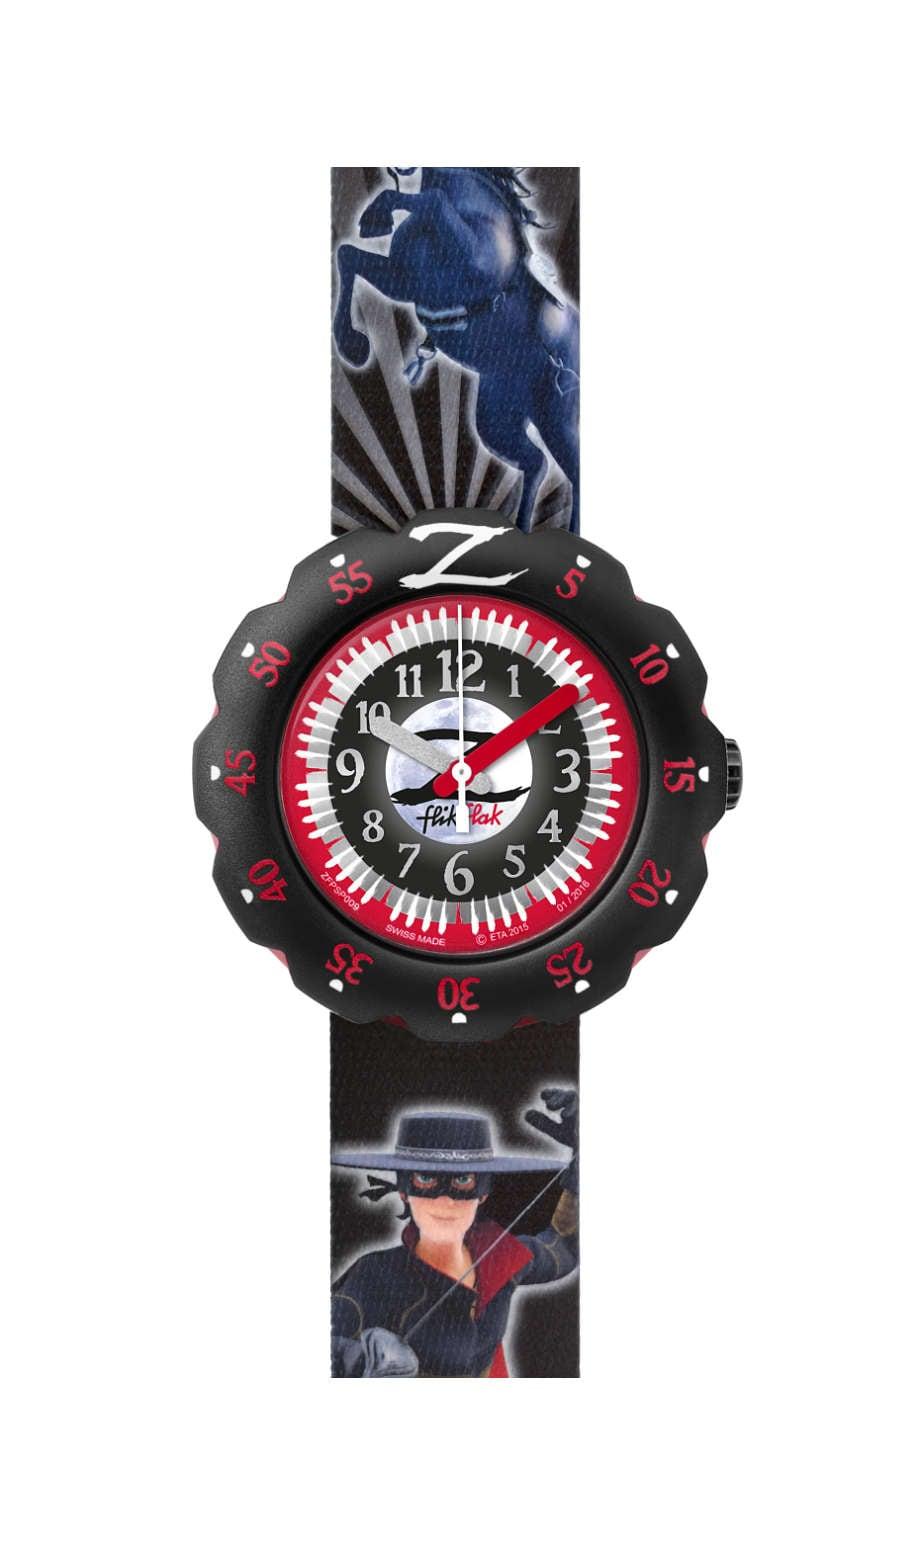 Swatch - ZORRO - 1